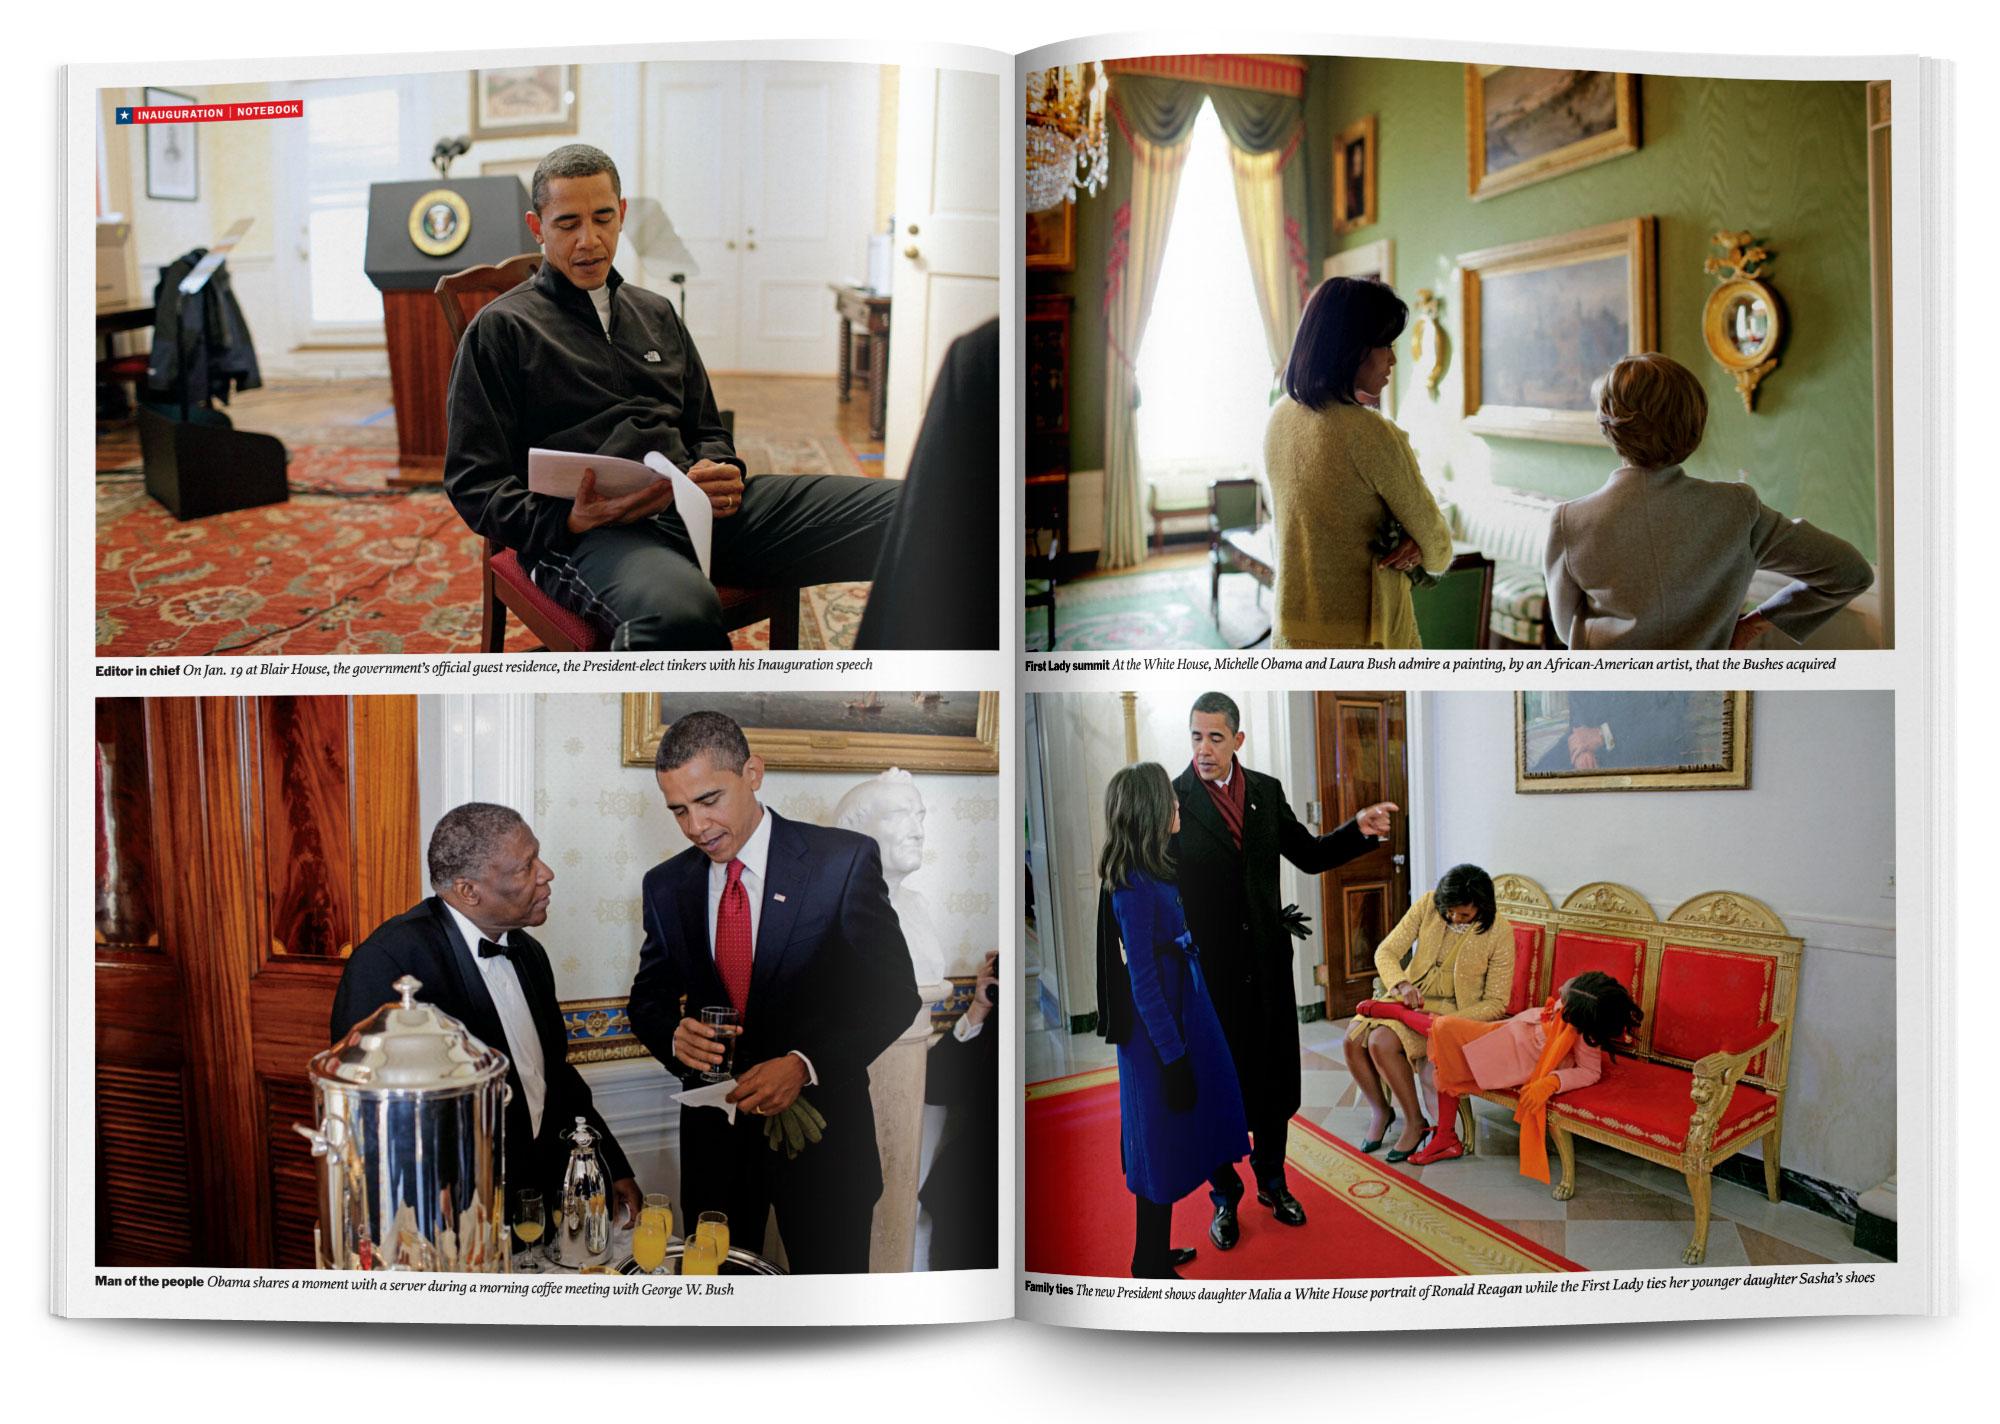 layouts.obamainaug4.jpg